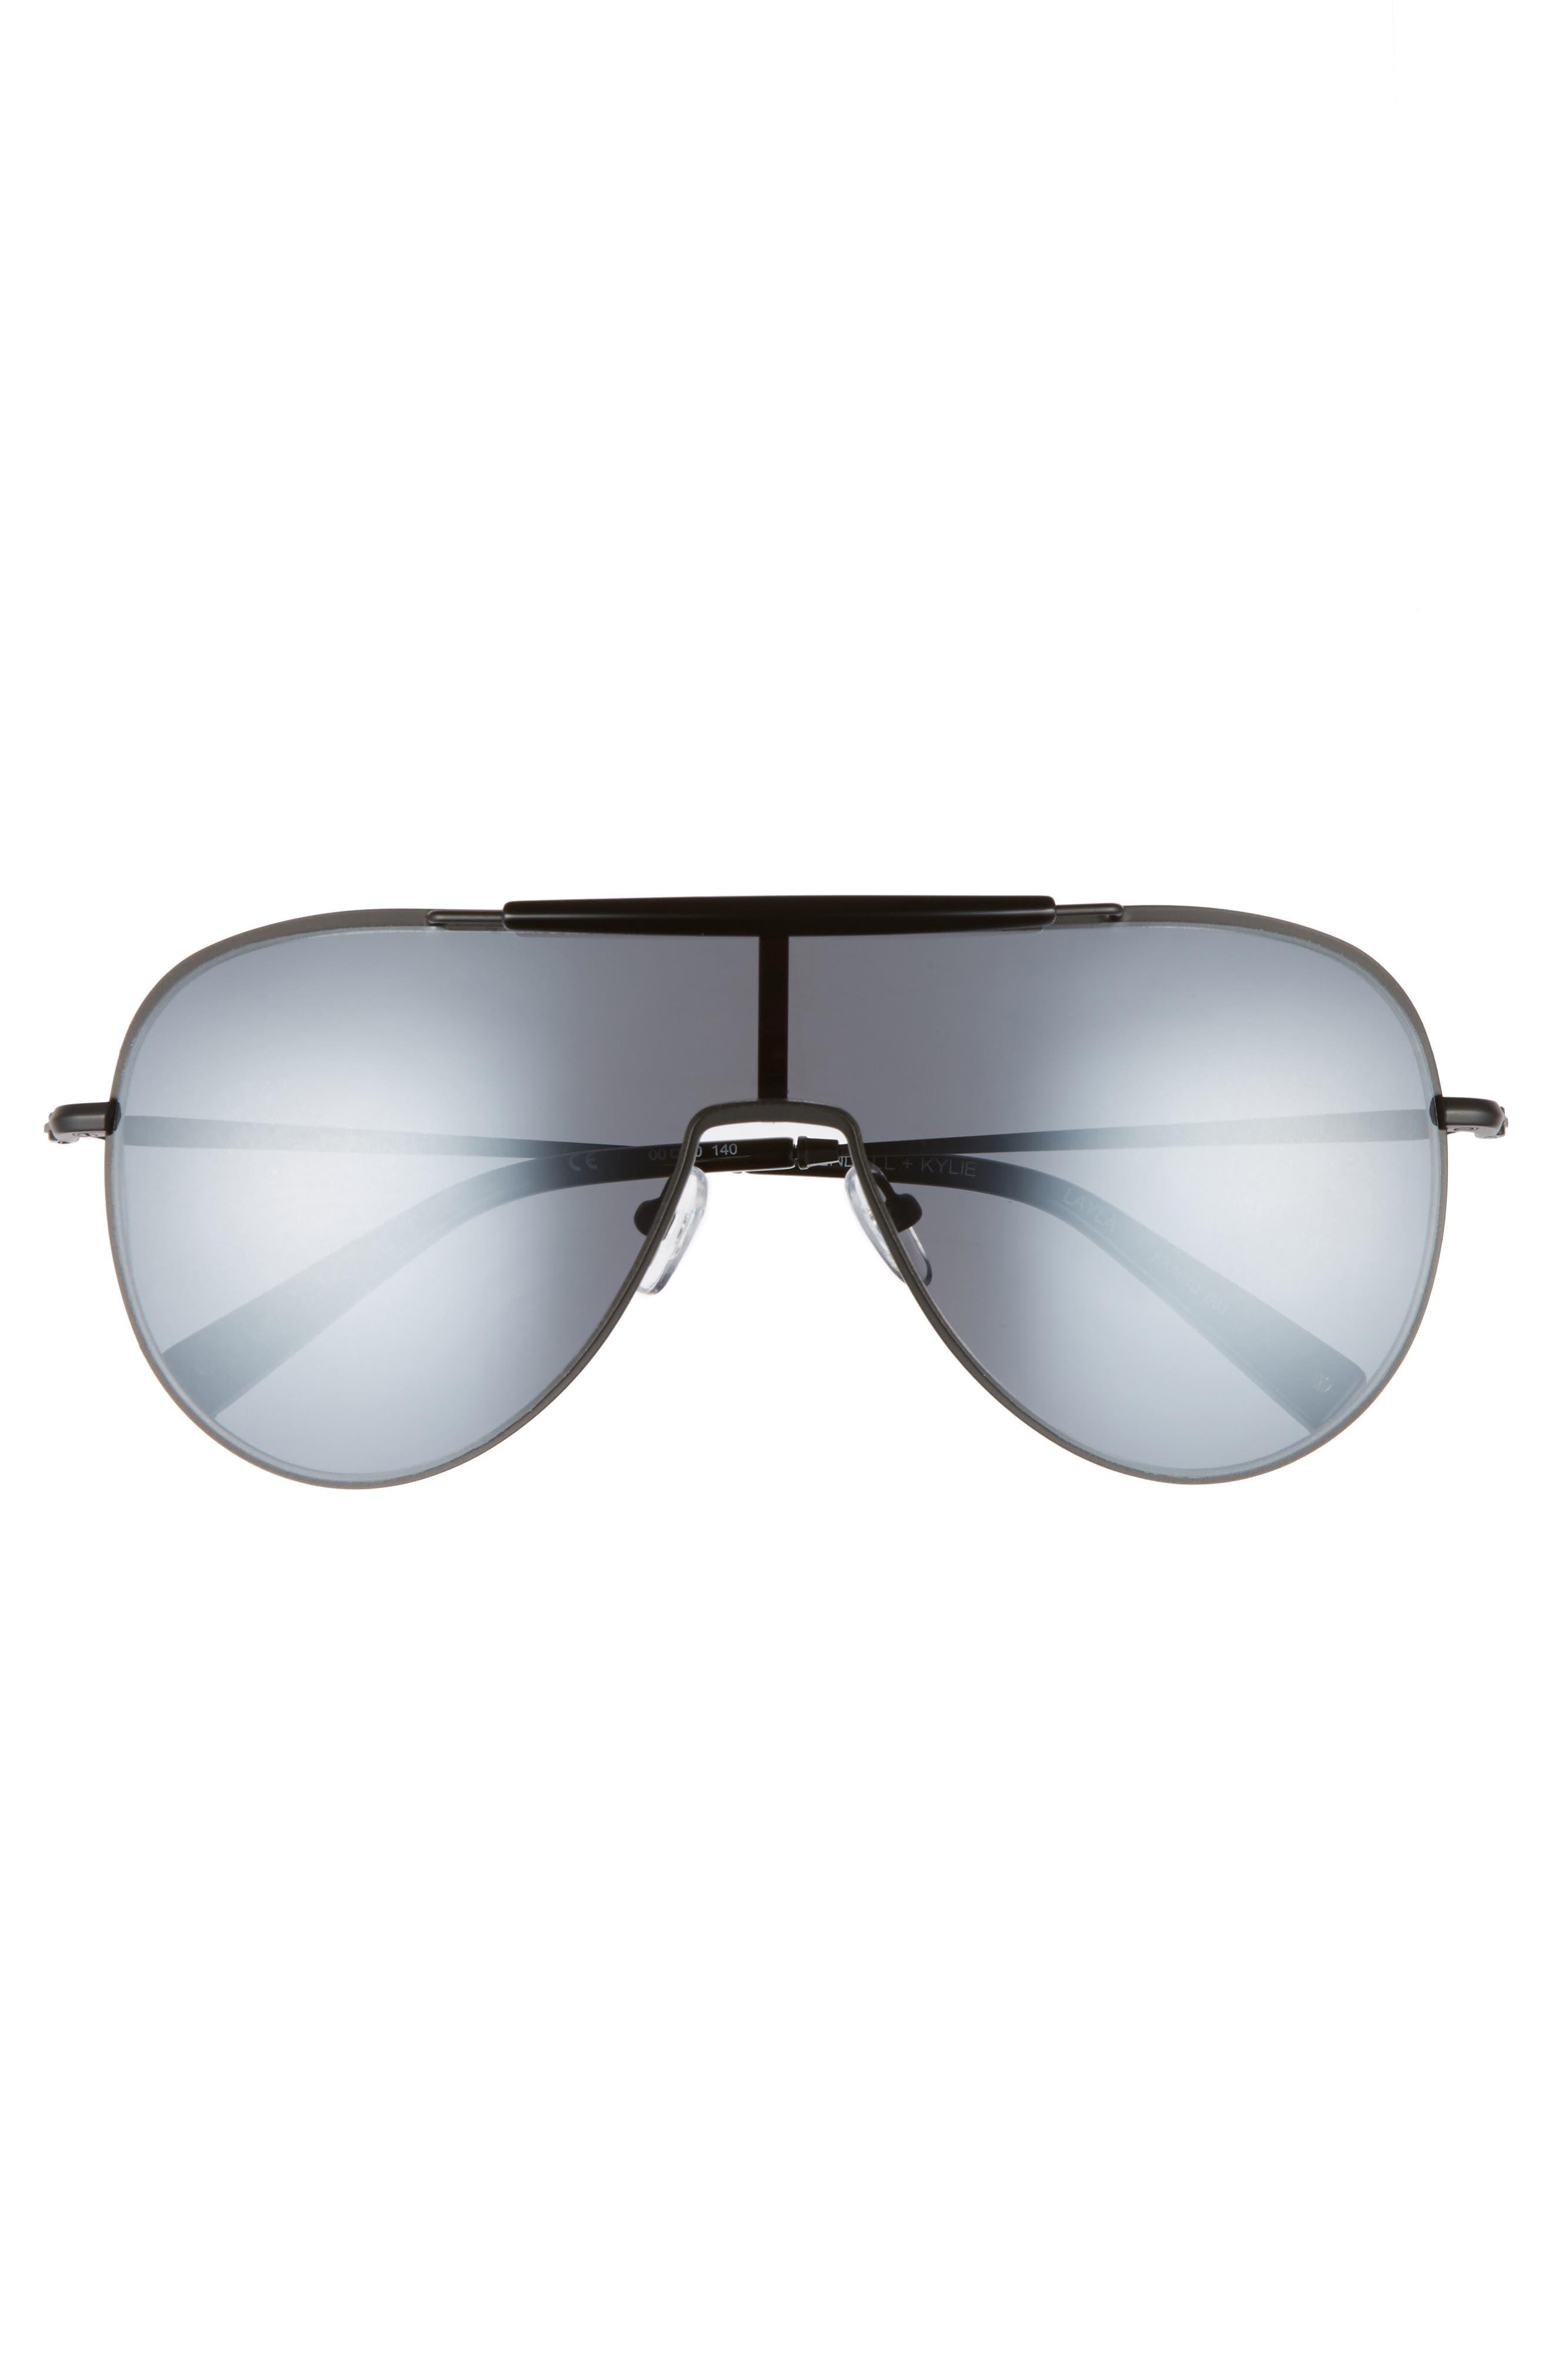 Shield Aviator Sunglasses,                             Alternate thumbnail 3, color,                             001